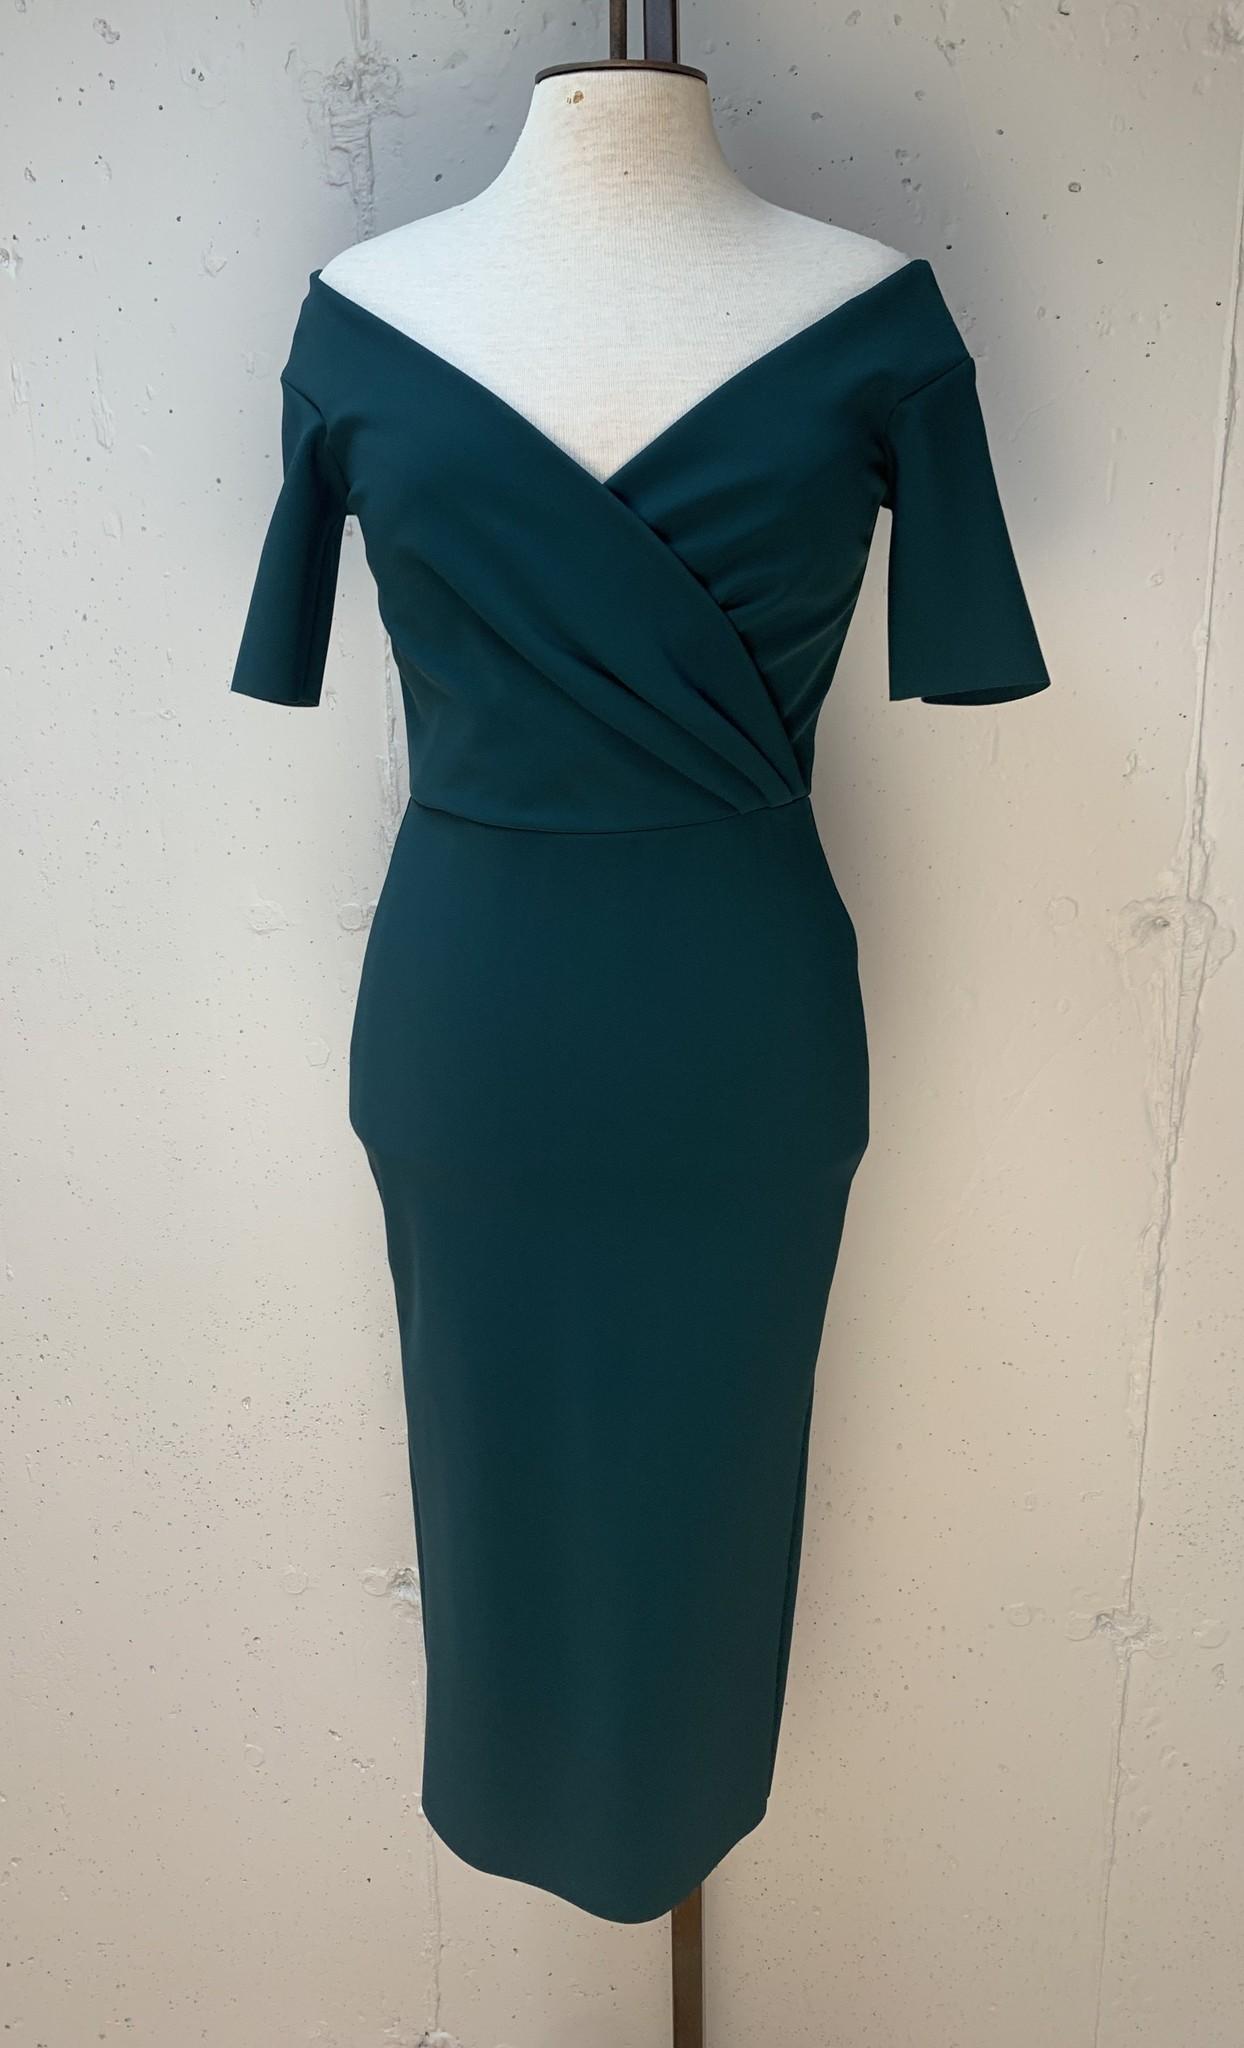 Greta Constantine Delft Dress